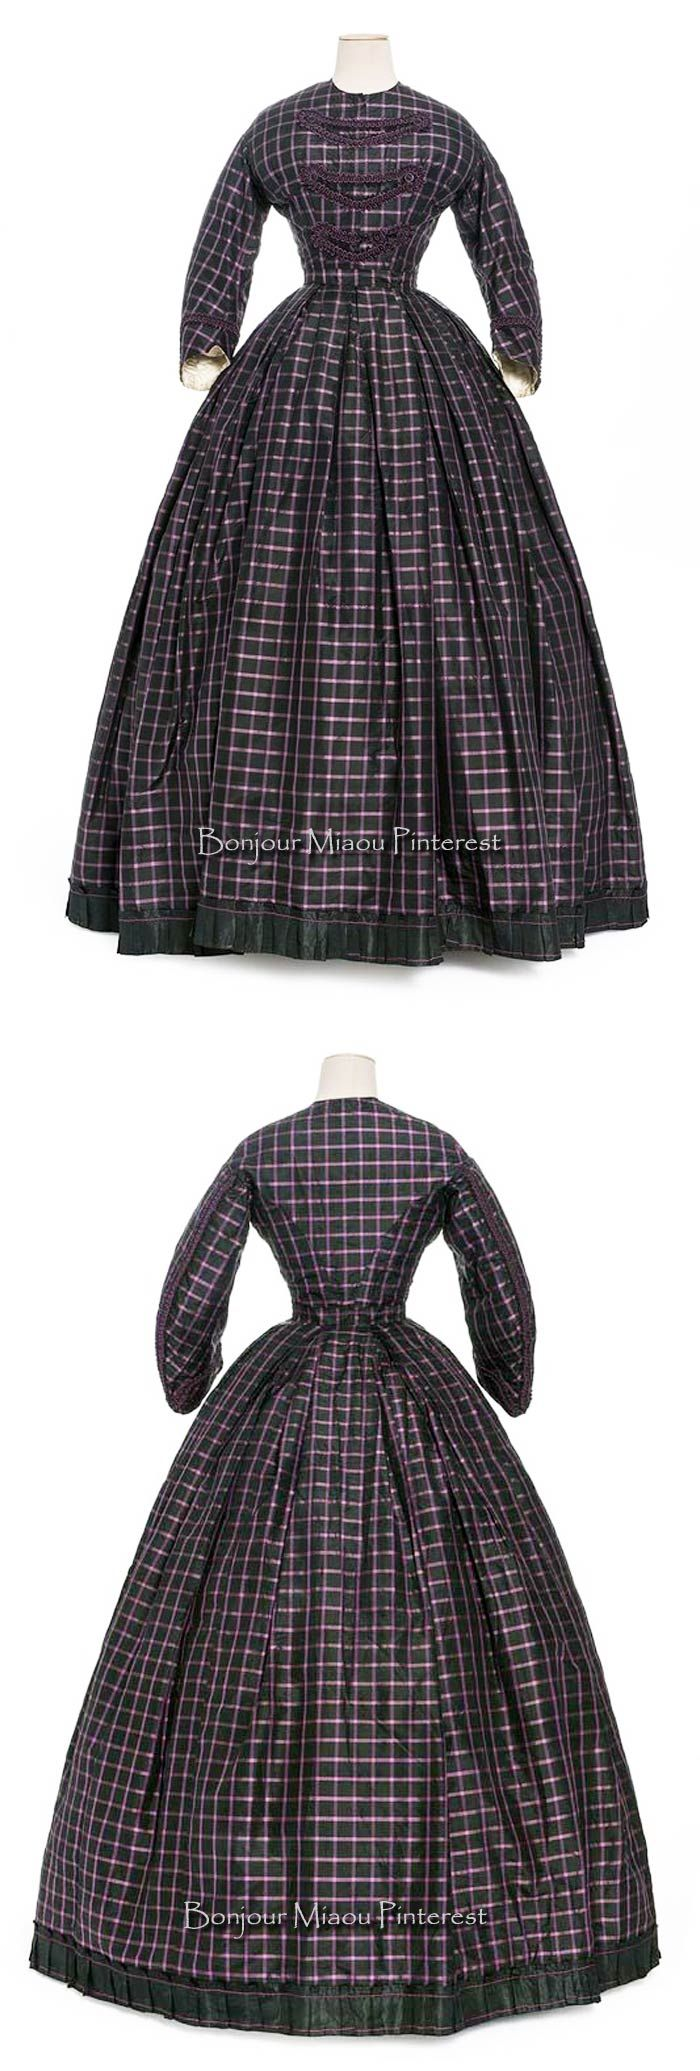 Day dress ca. 1860–65. Silk faille. Les Arts Décoratifs